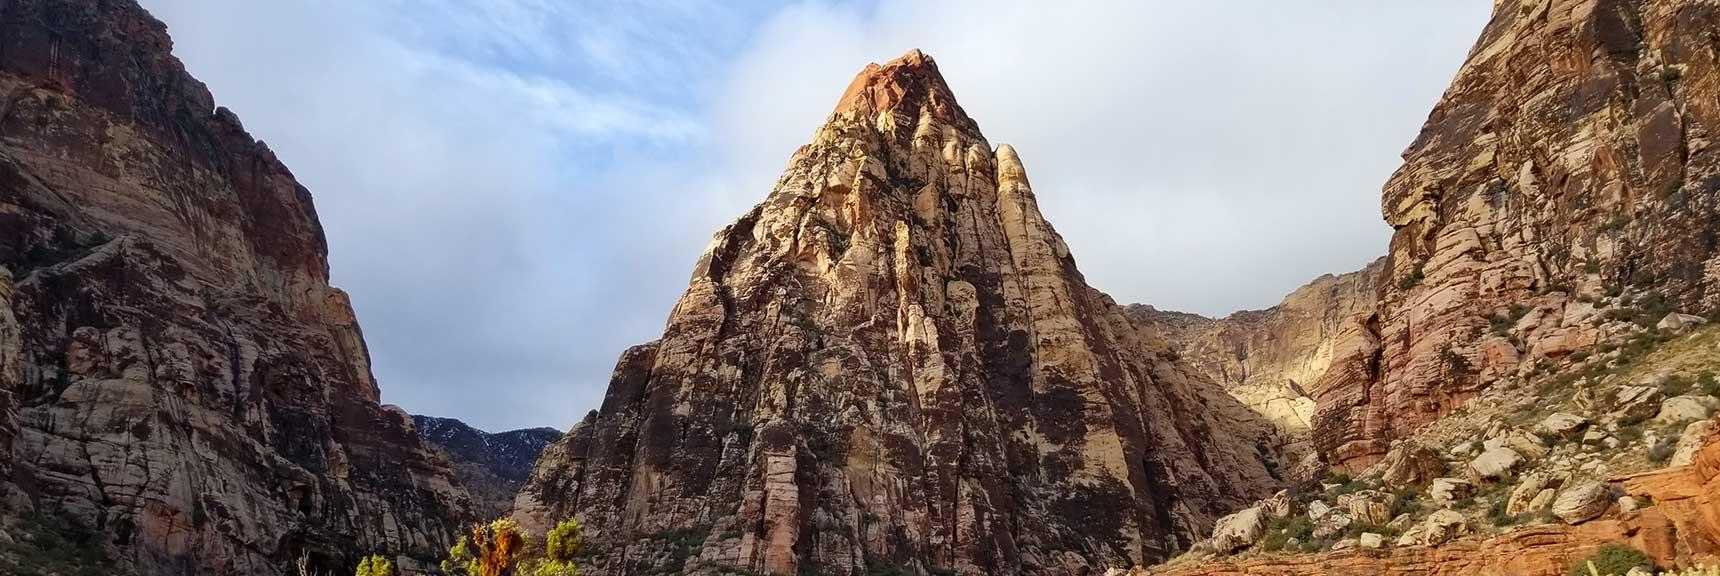 Pine Creek Canyon, Red Rock Park, Nevada